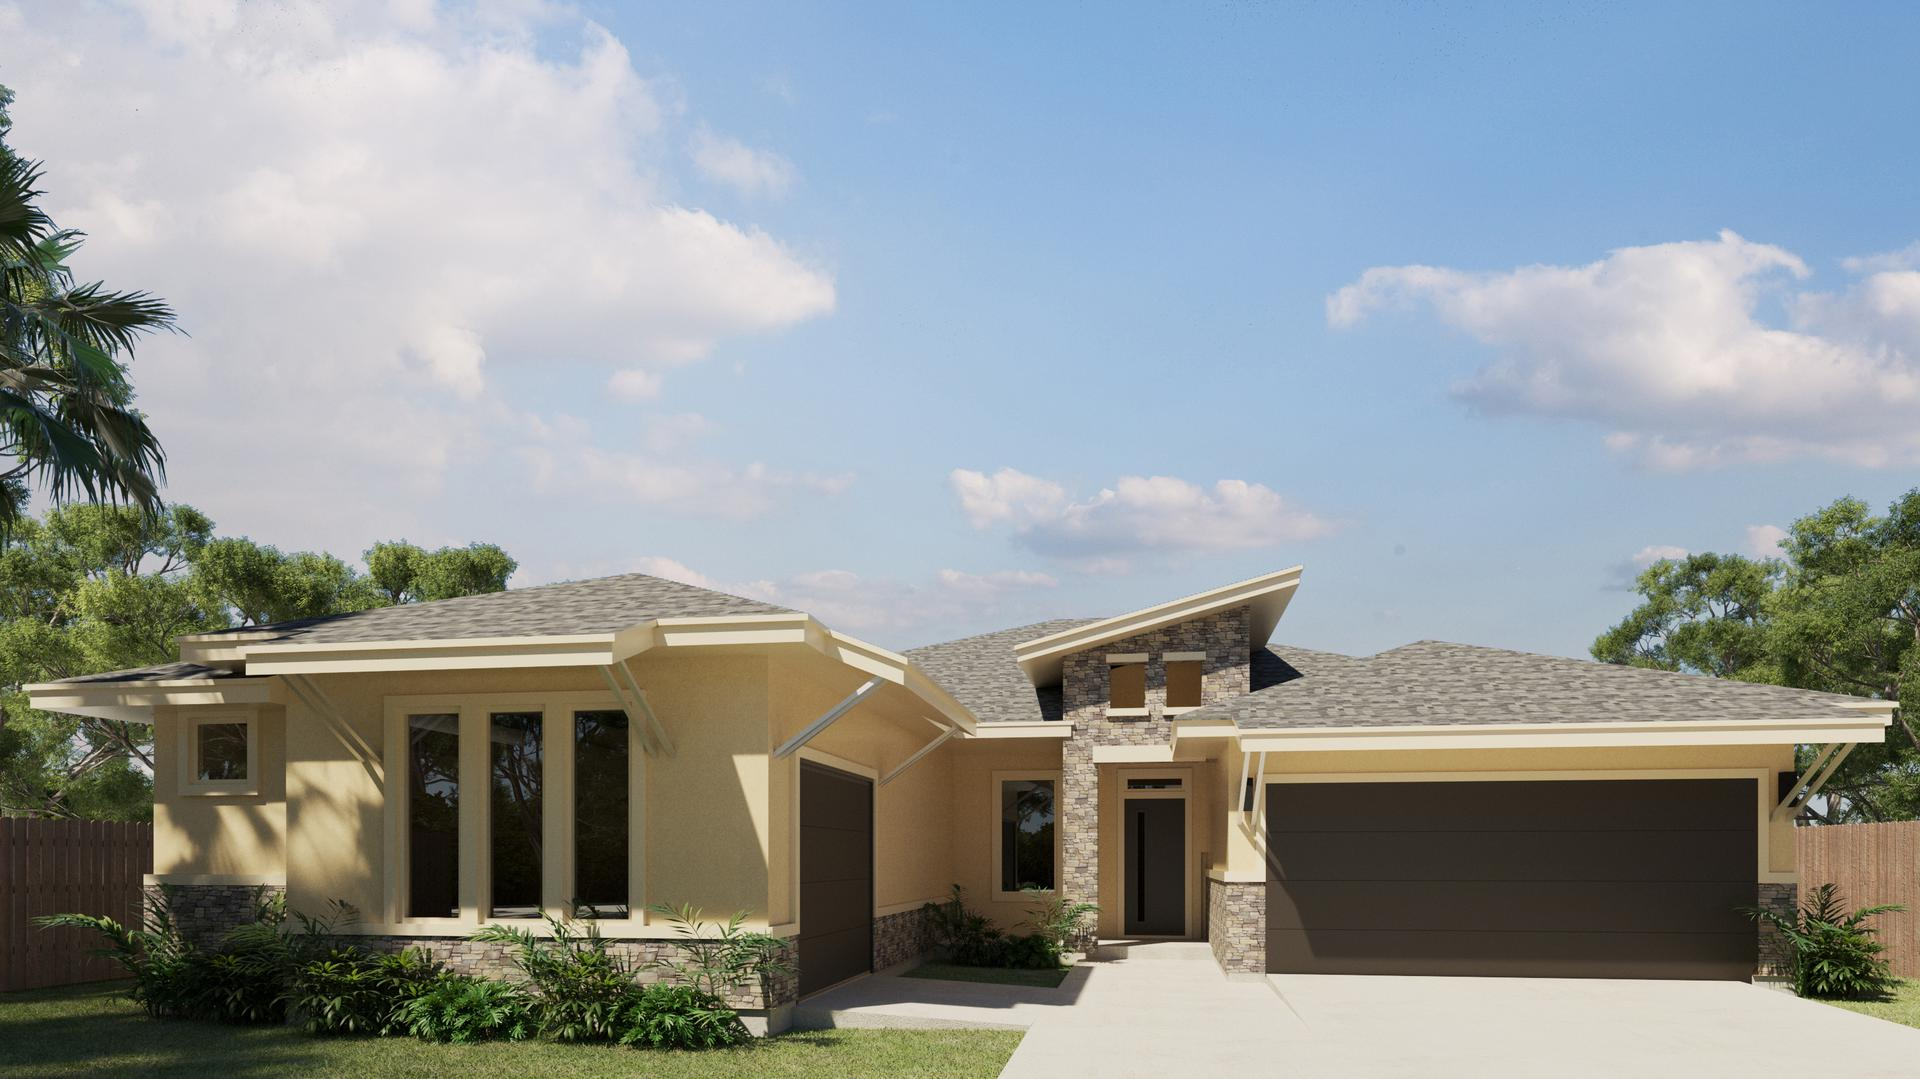 The Espada new home in McAllen , TX